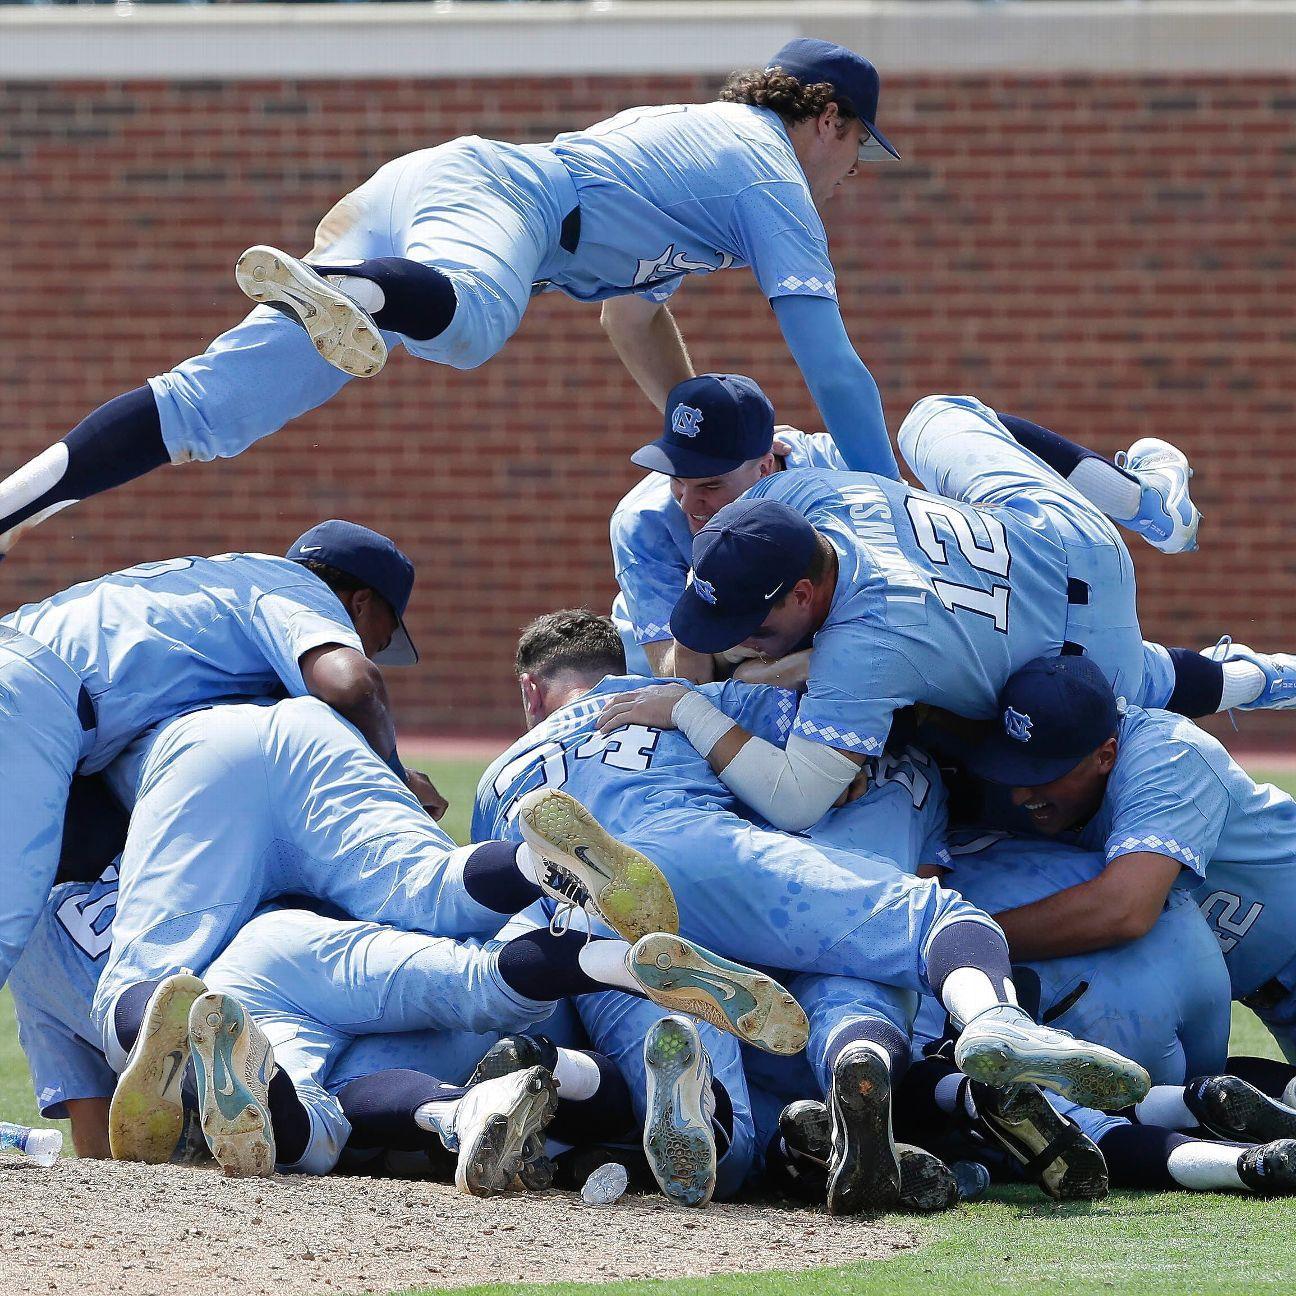 University Of Florida Baseball Has Become Pitching U Under Kevin O'Sullivan